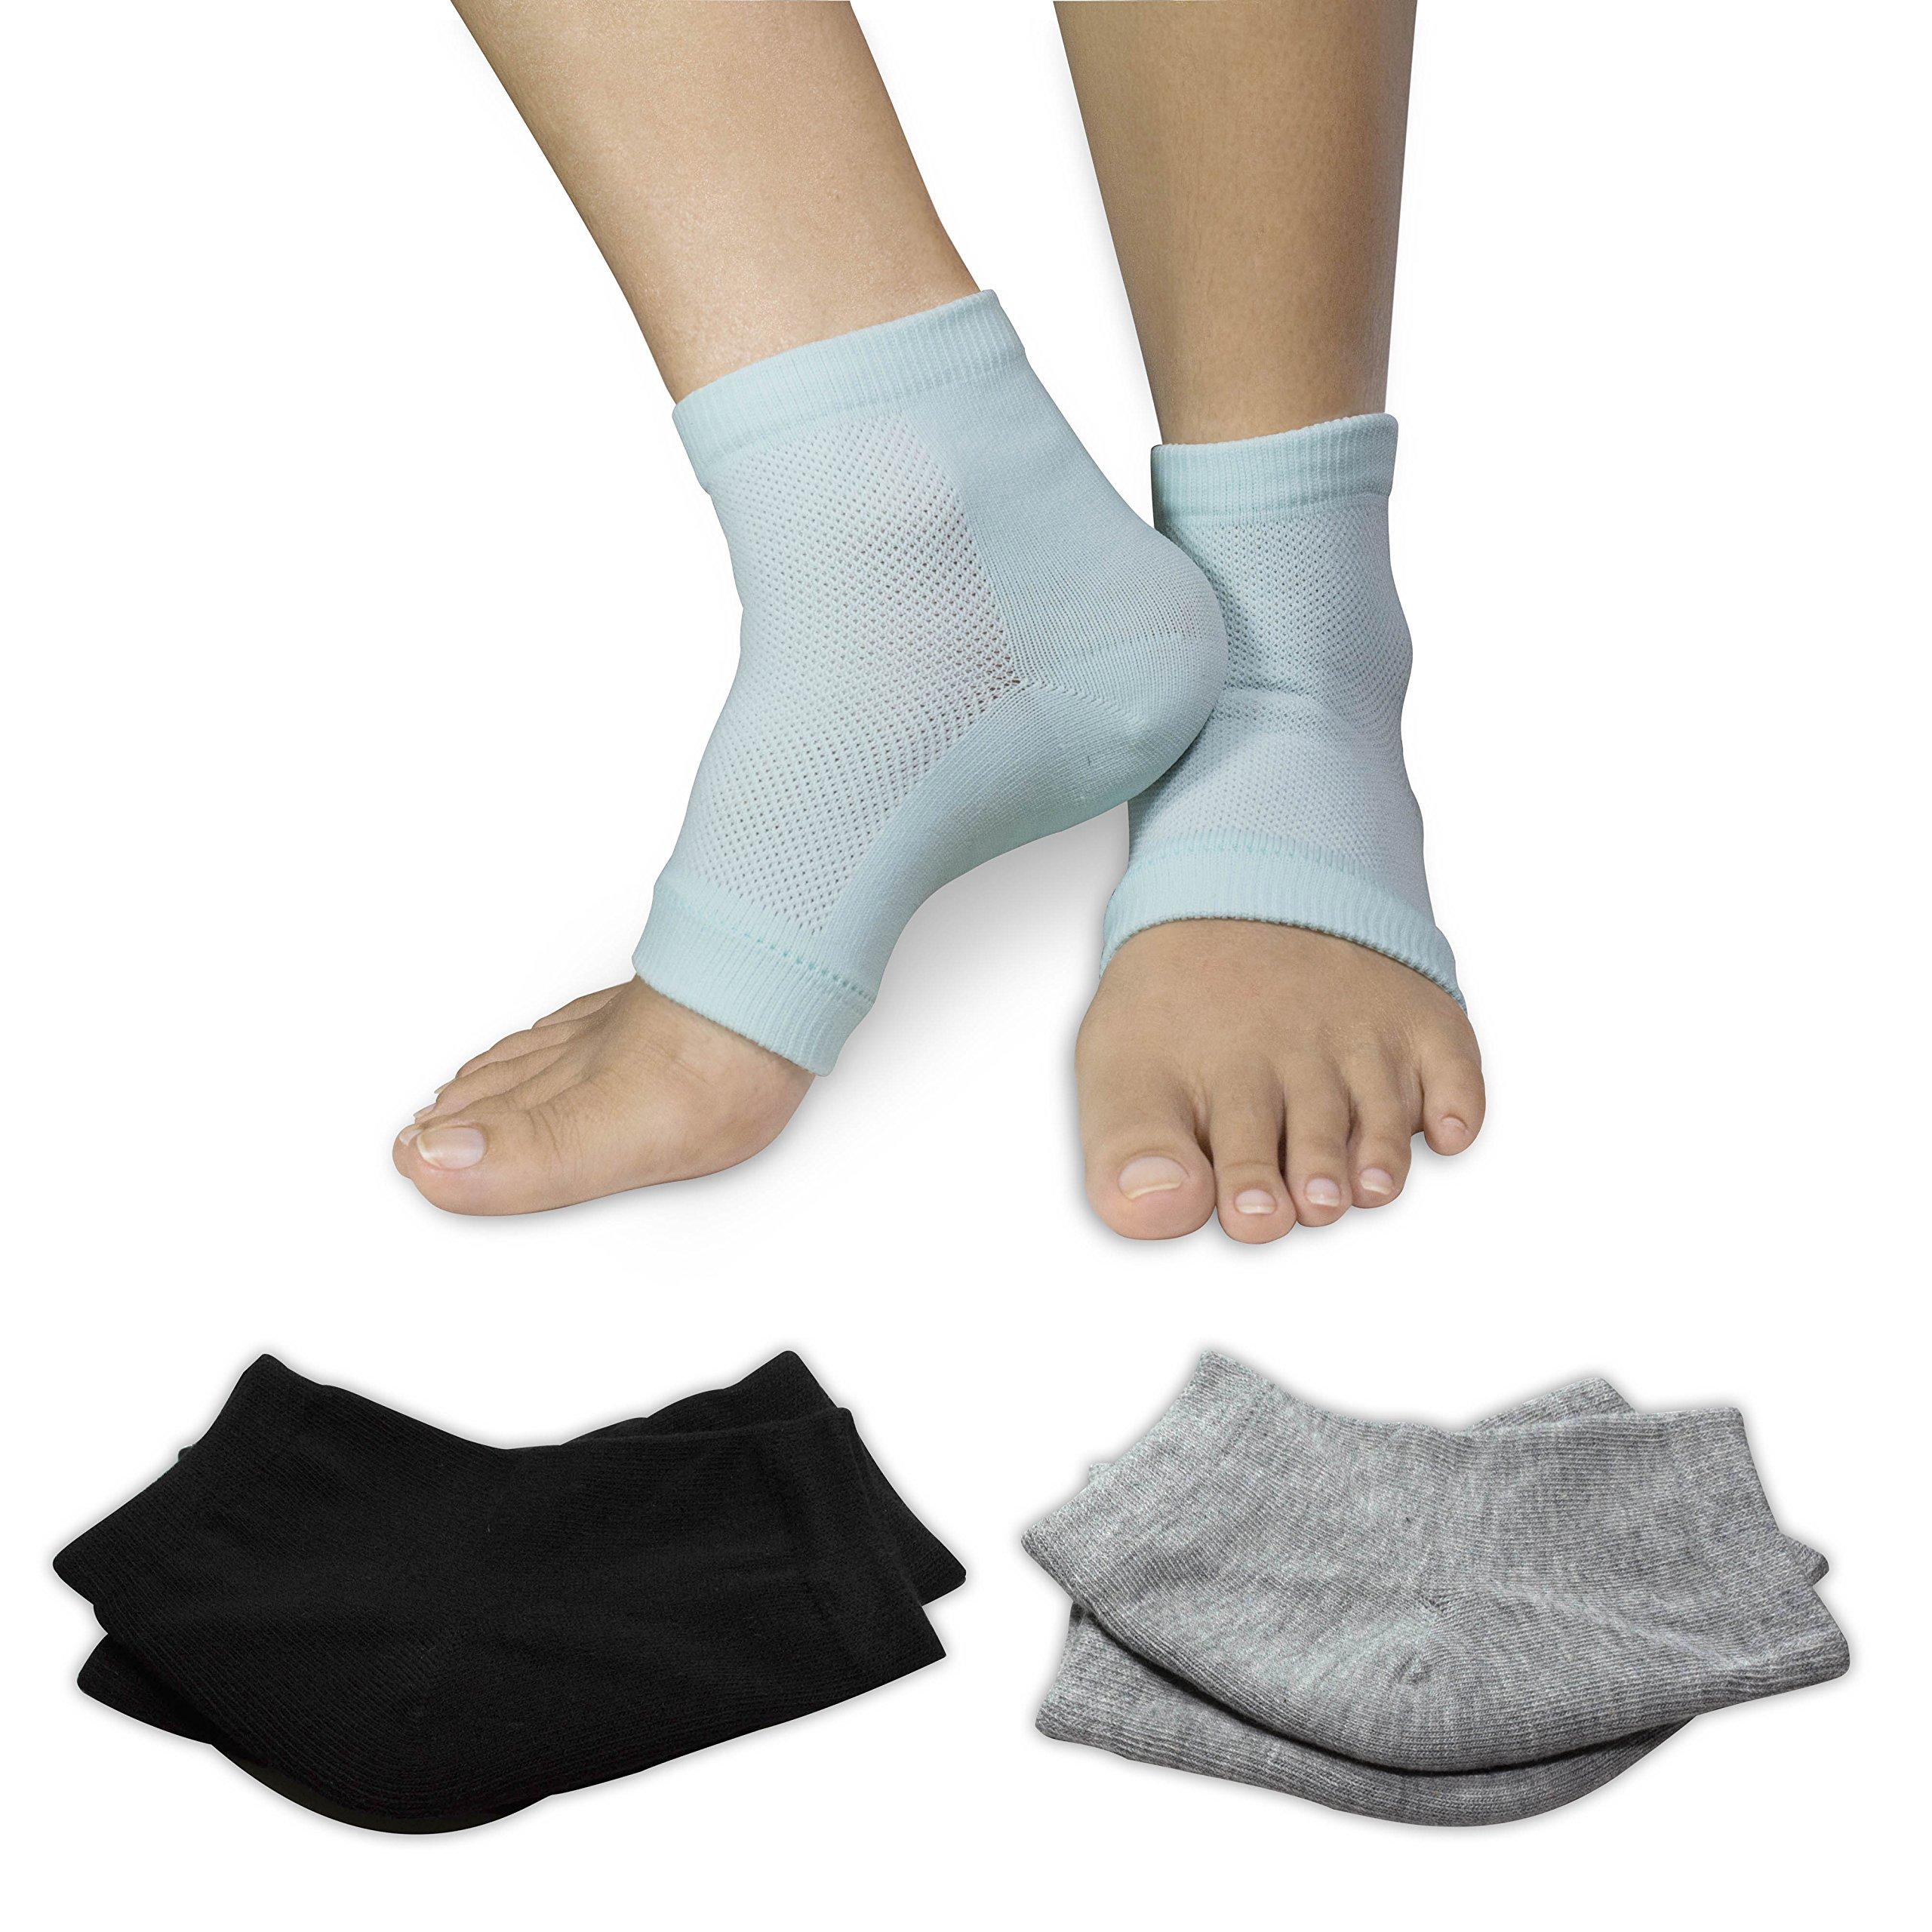 3 PAIRS-Moisturizing Gel Heel Socks w/ Enriched Vitamins for Dry Hard Cracked Heels & DIY Simple Home Remedies by Triim Fitness by Triim Fitness (Image #2)